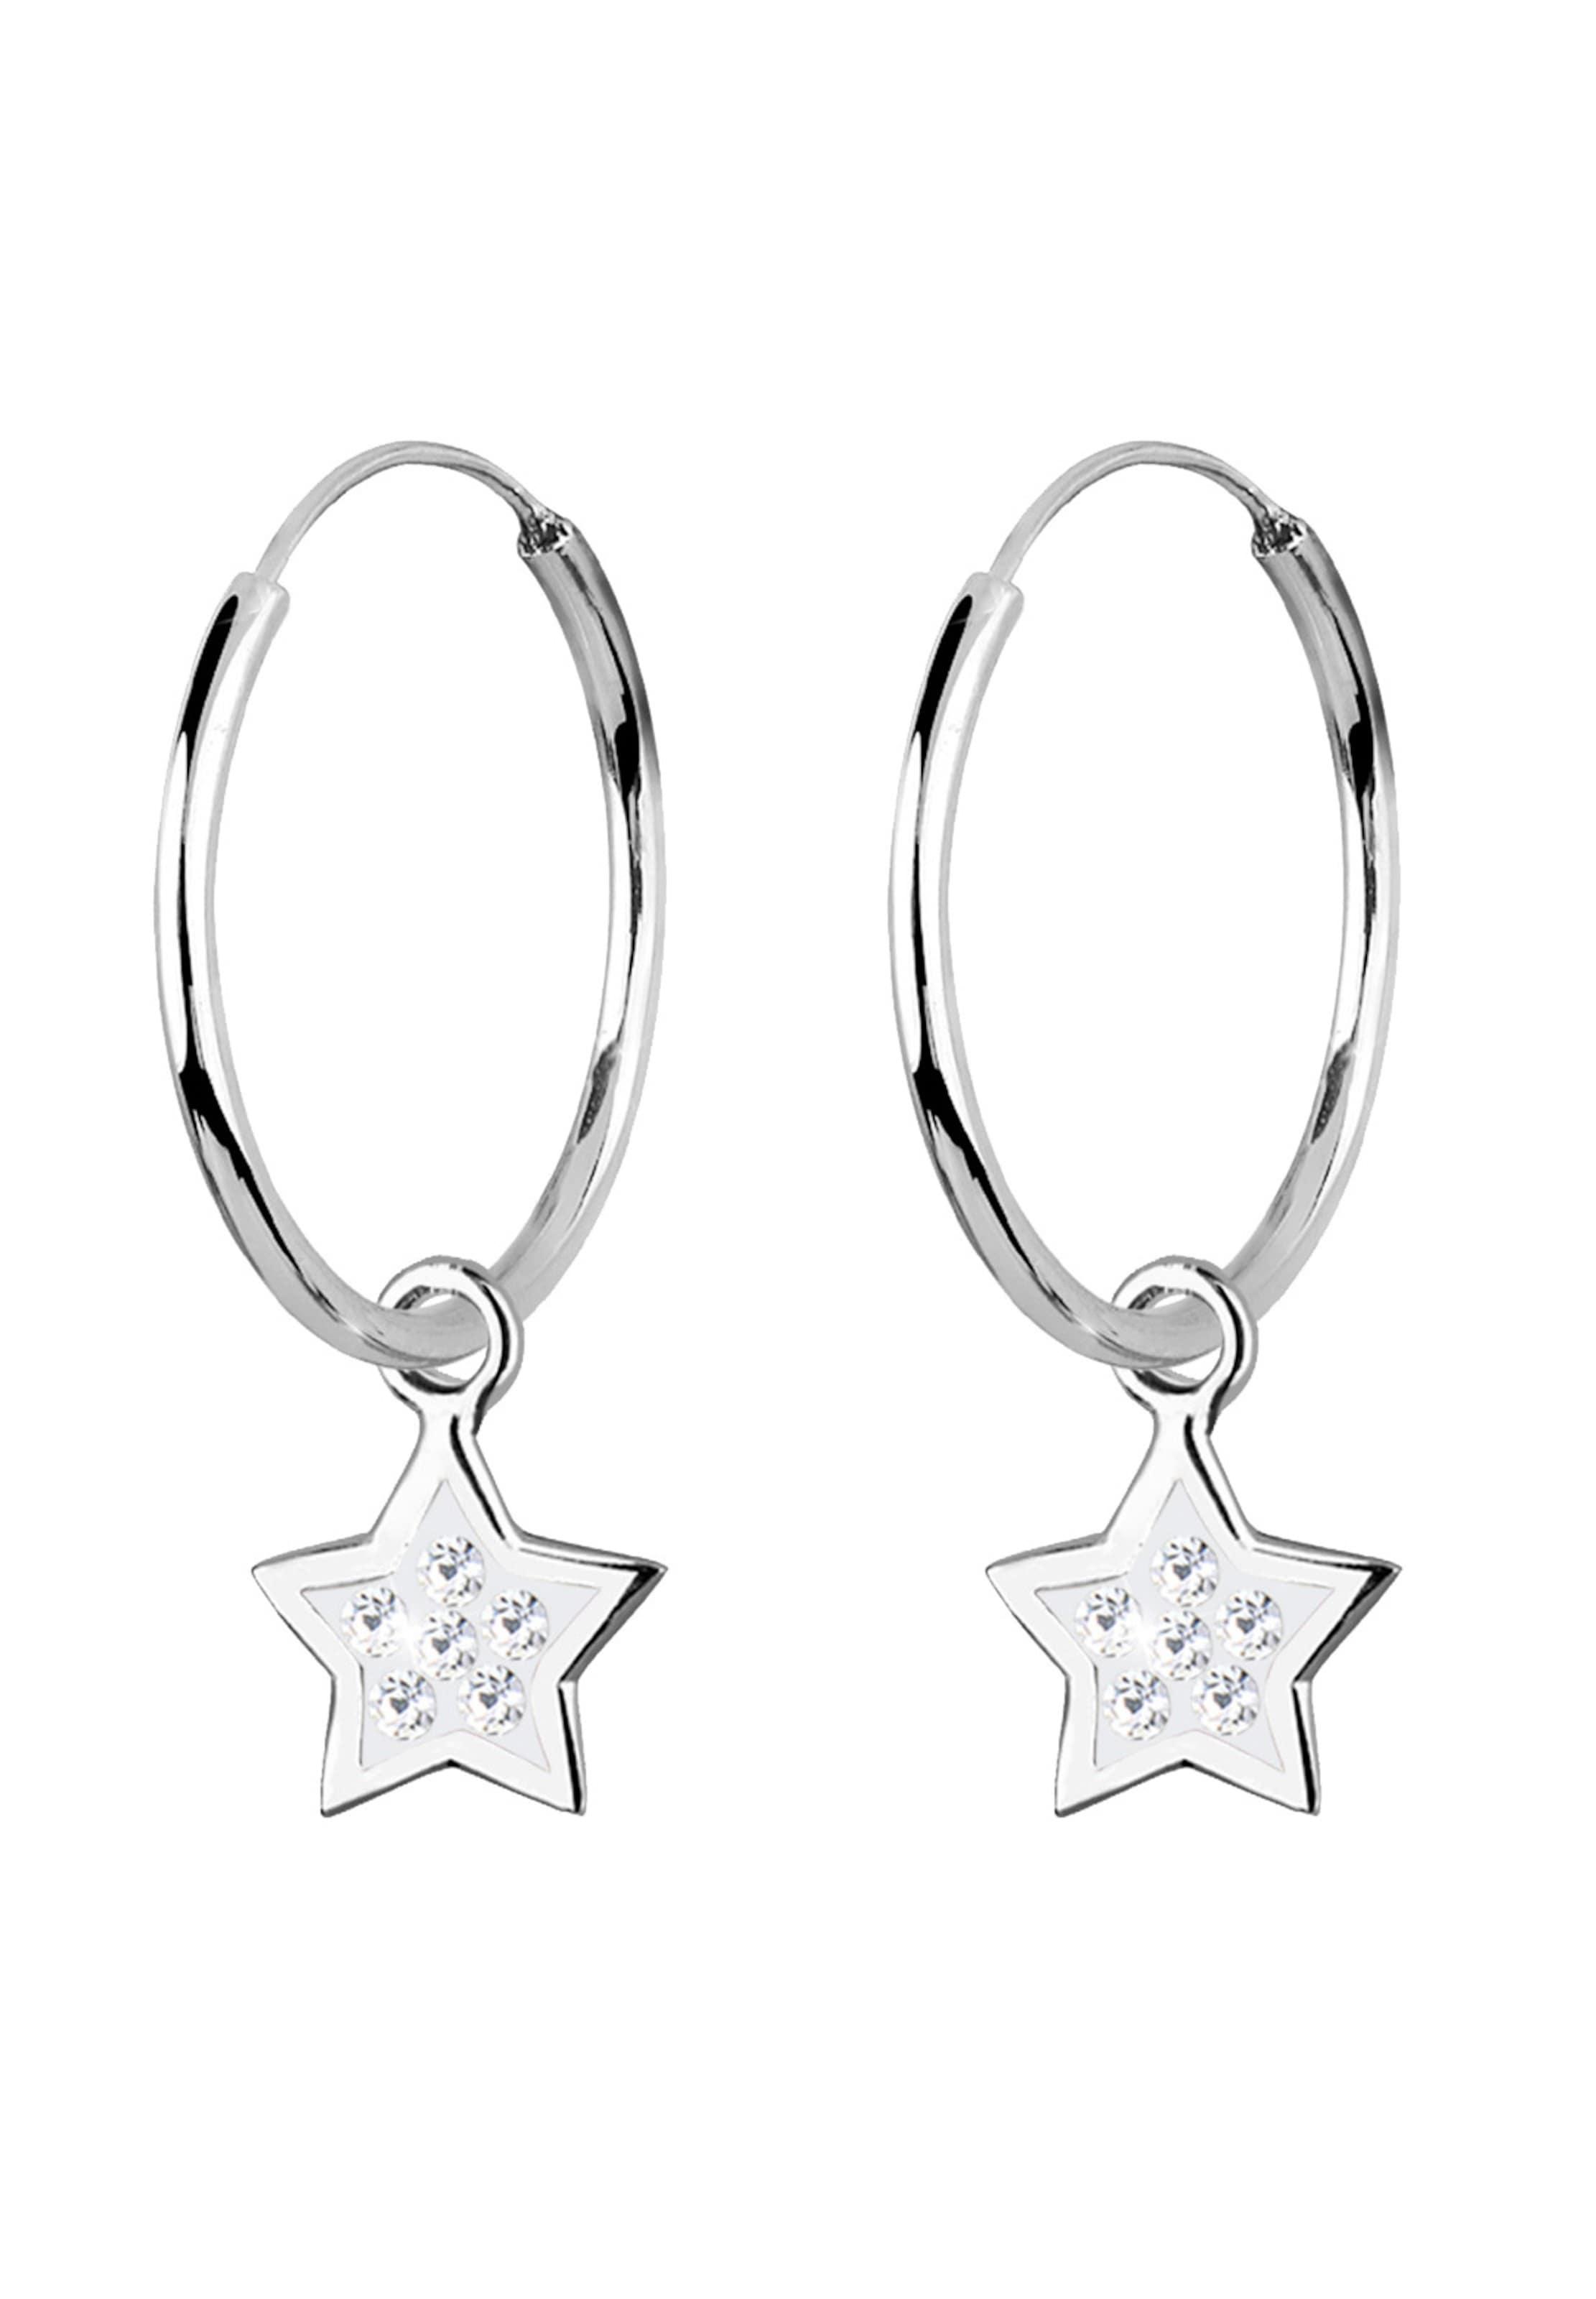 Ohrringe SilberTransparent SilberTransparent Ohrringe Elli In Elli SilberTransparent In Elli In Ohrringe EHeWD9b2IY